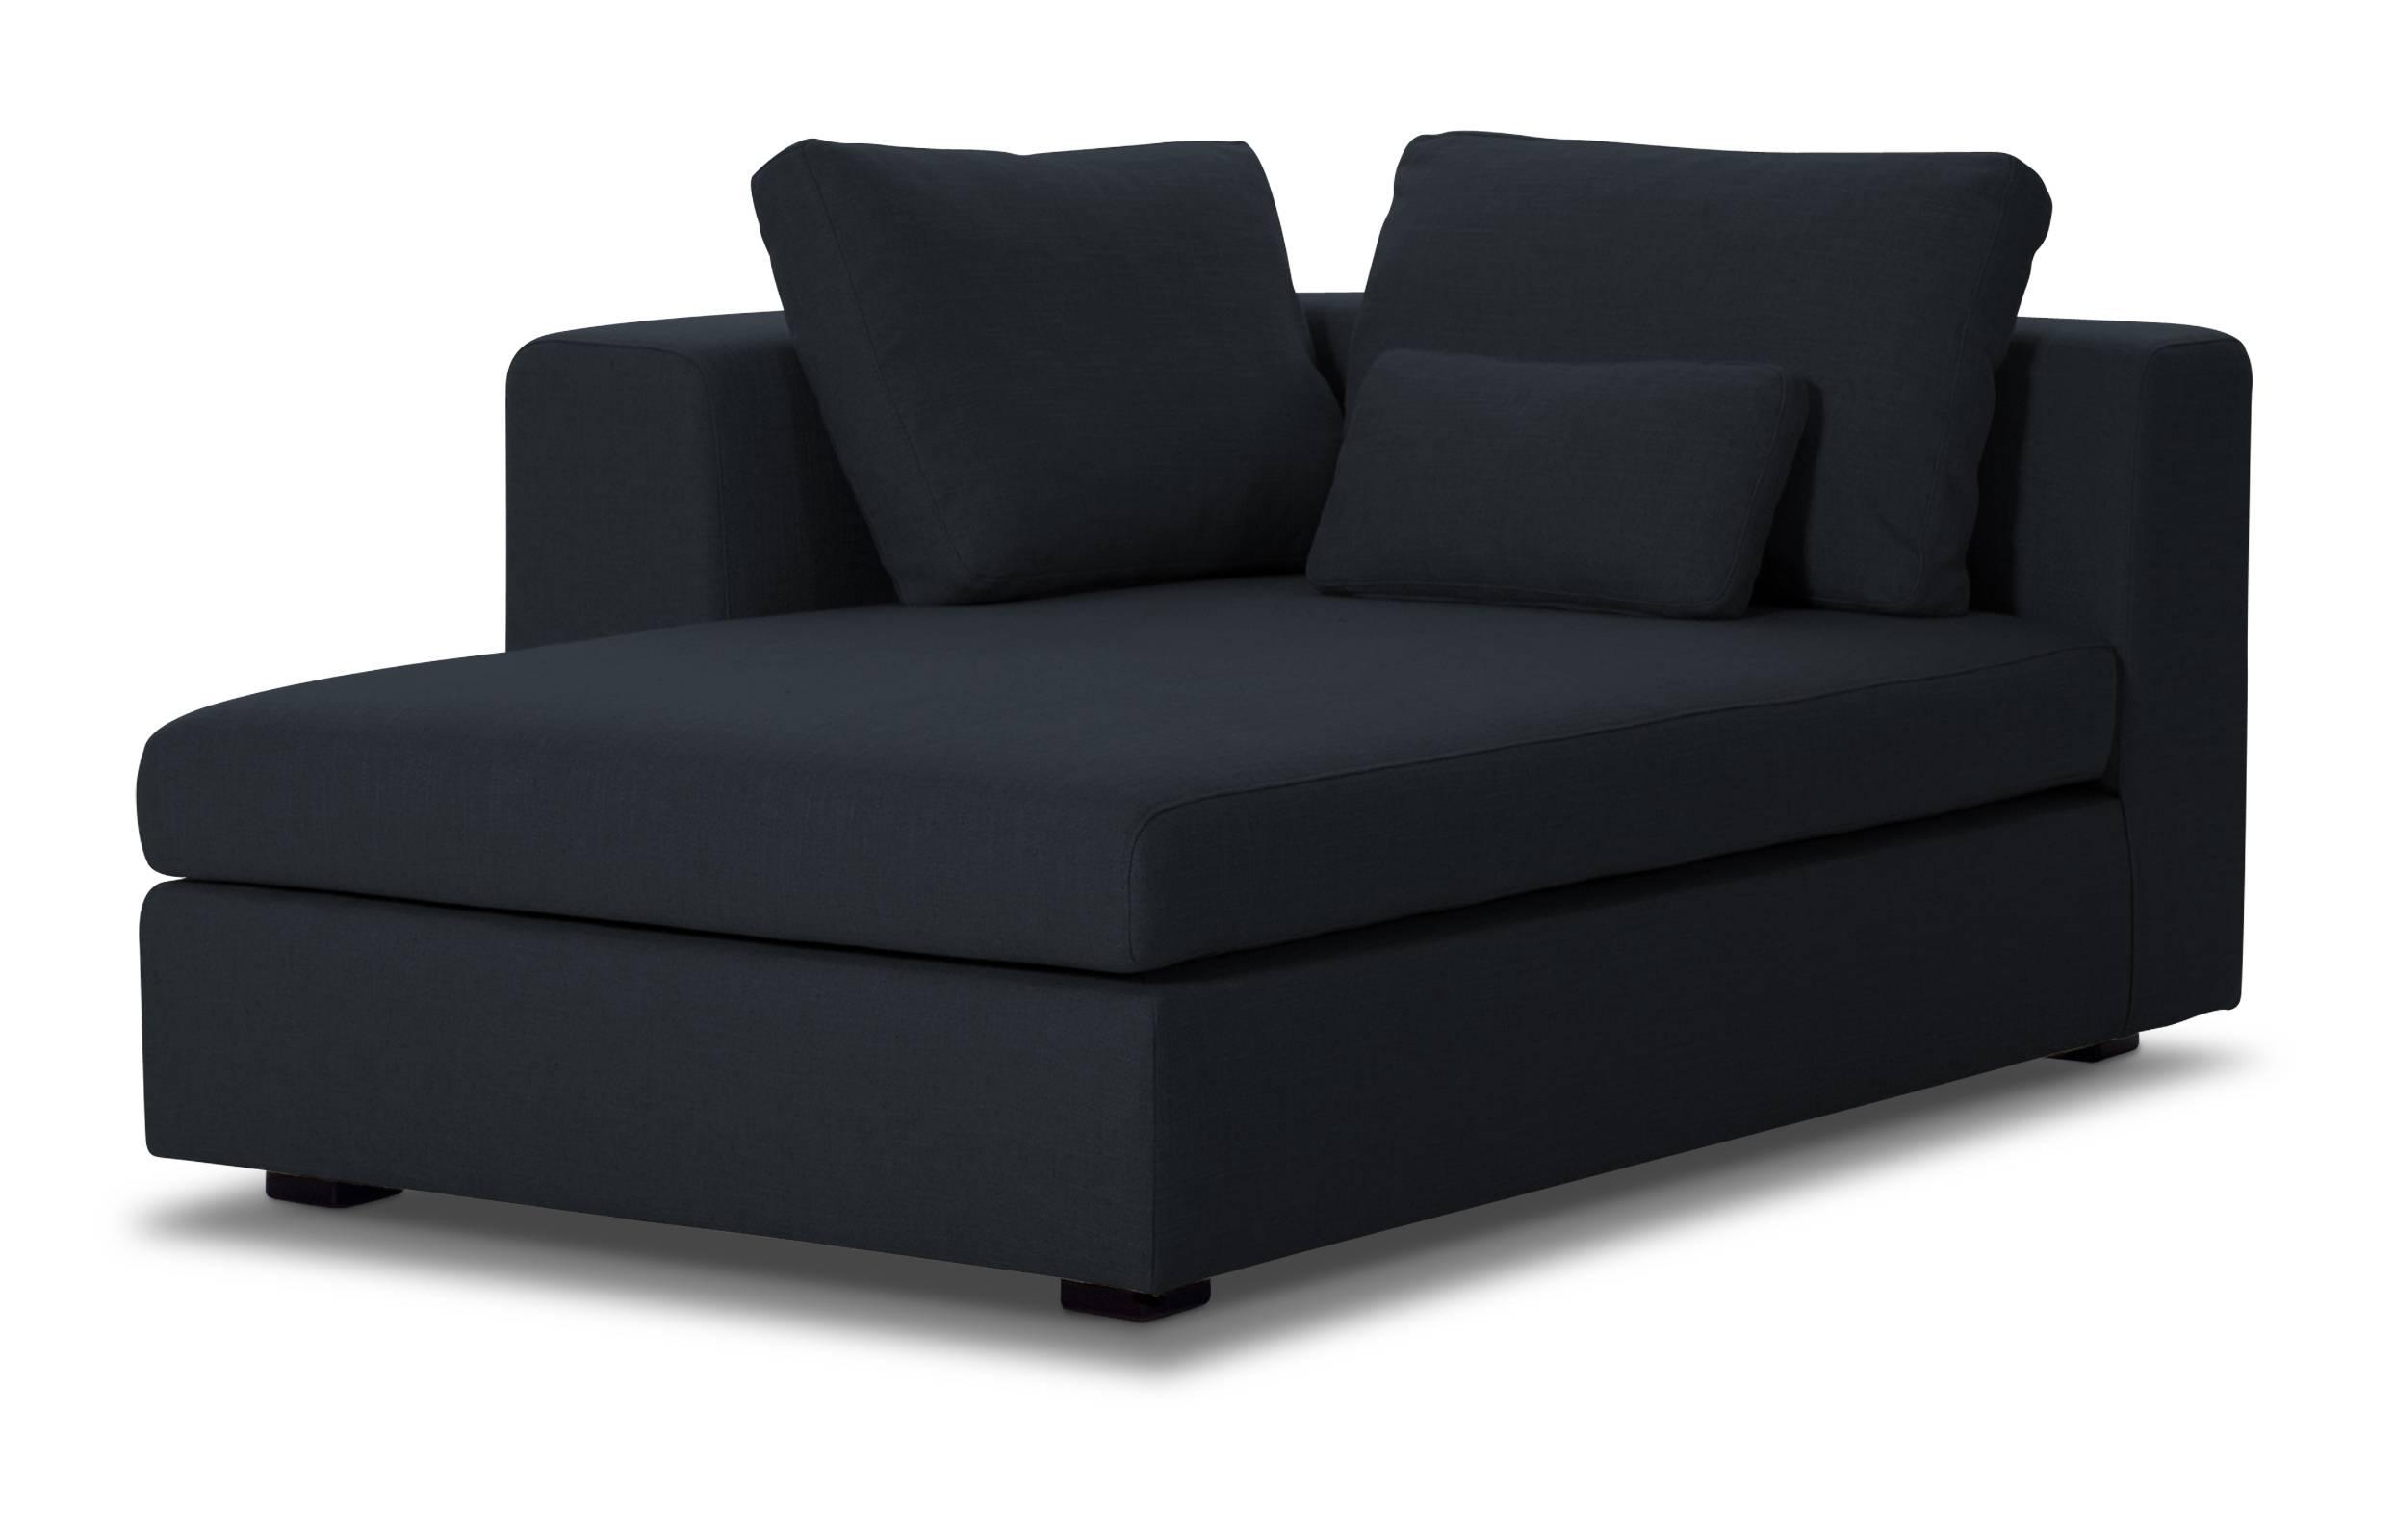 Full Size of Natura Sofa Brooklyn Couch Denver Livingston Love Newport Gebraucht Pasadena Kansas Home Kaufen Modulsofa Brick Sitzfeldtcom Büffelleder Mit Led Zweisitzer Sofa Natura Sofa